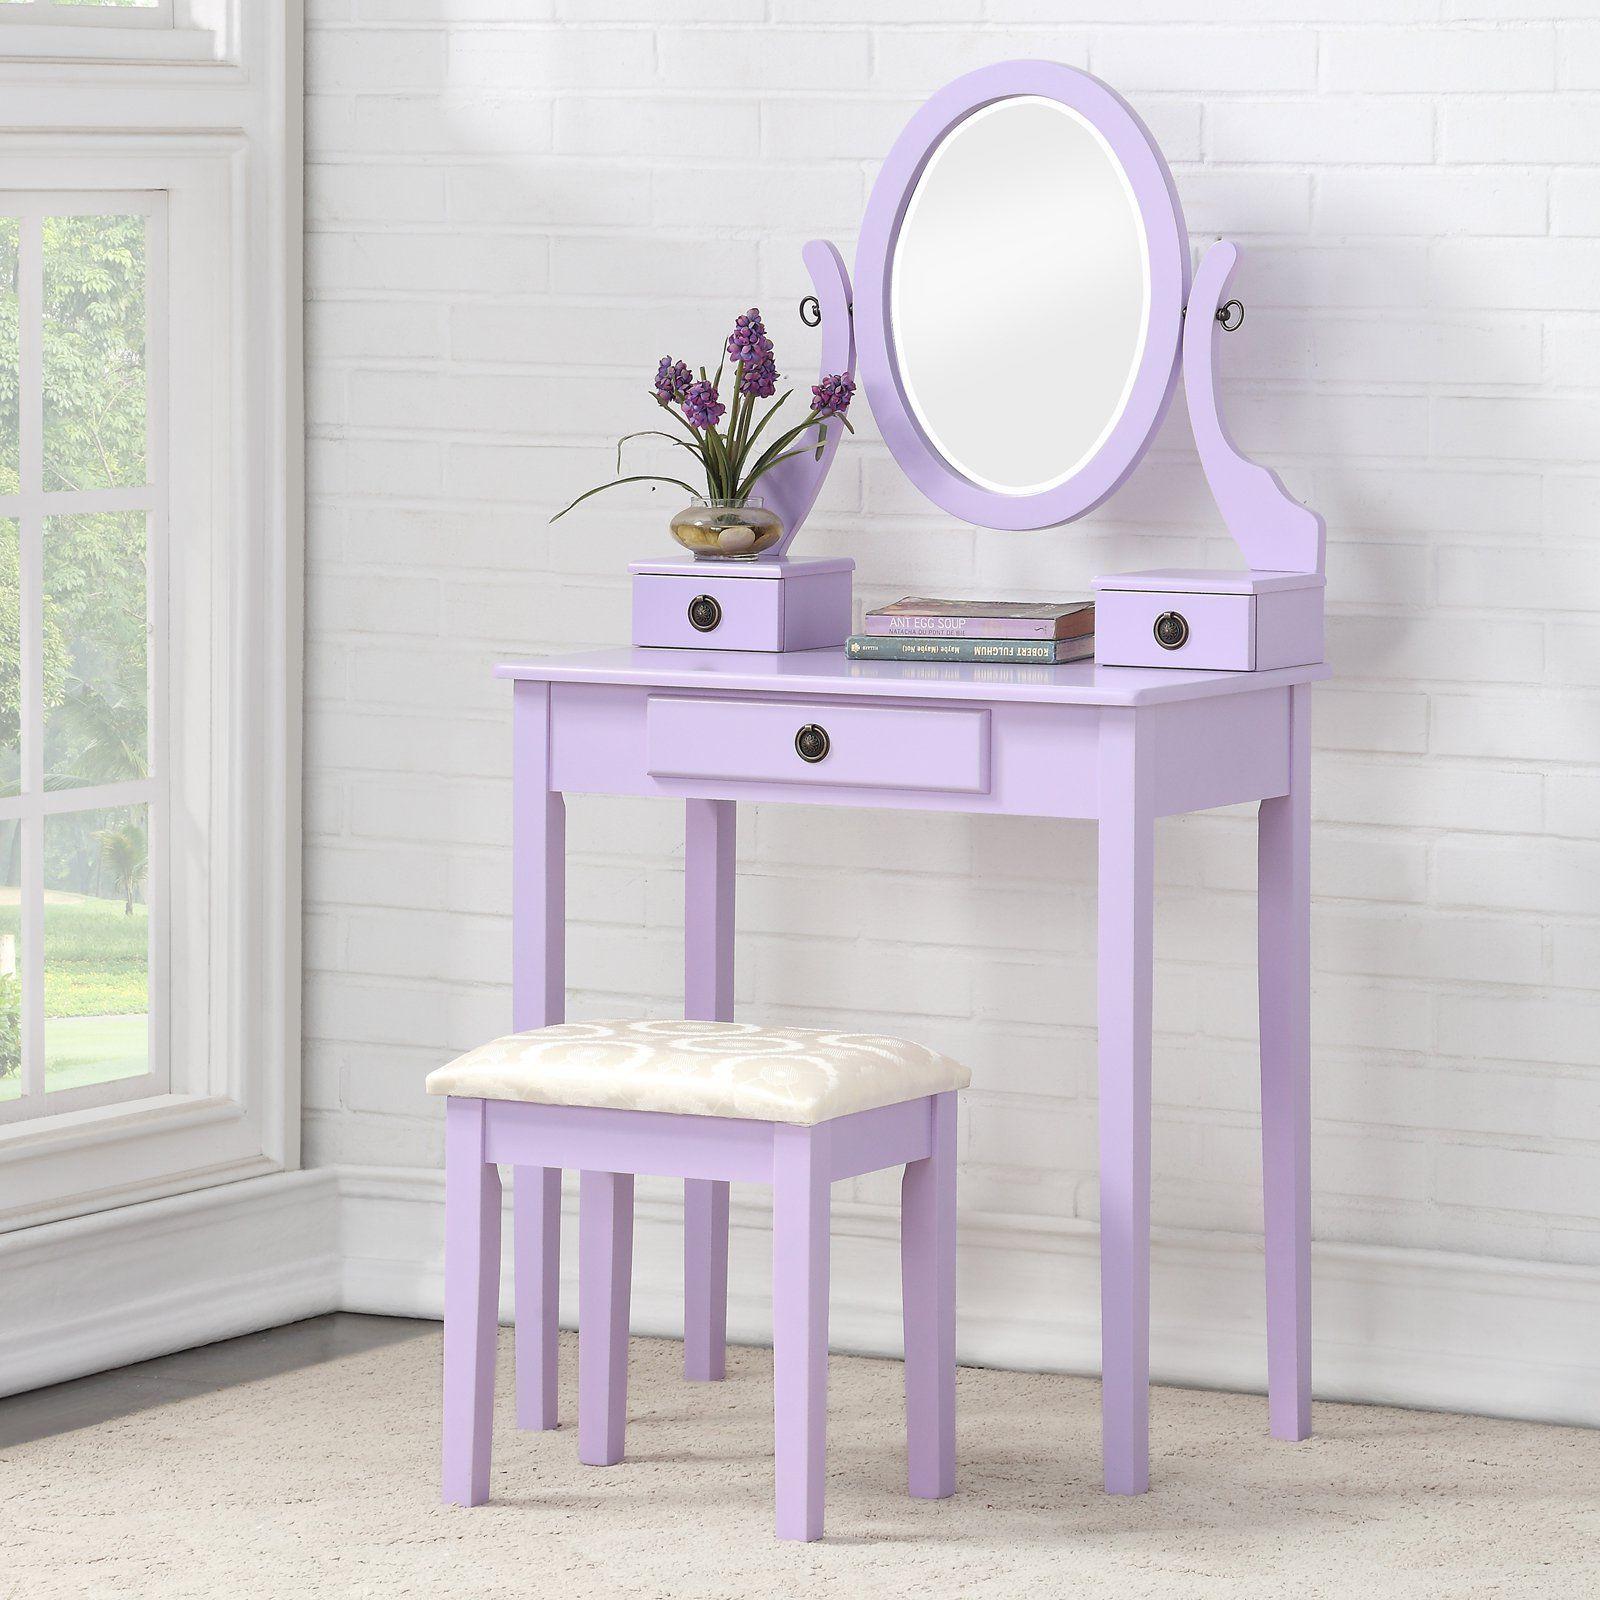 Roundhill Furniture Moniya Wooden Bedroom Vanity and Stool ...